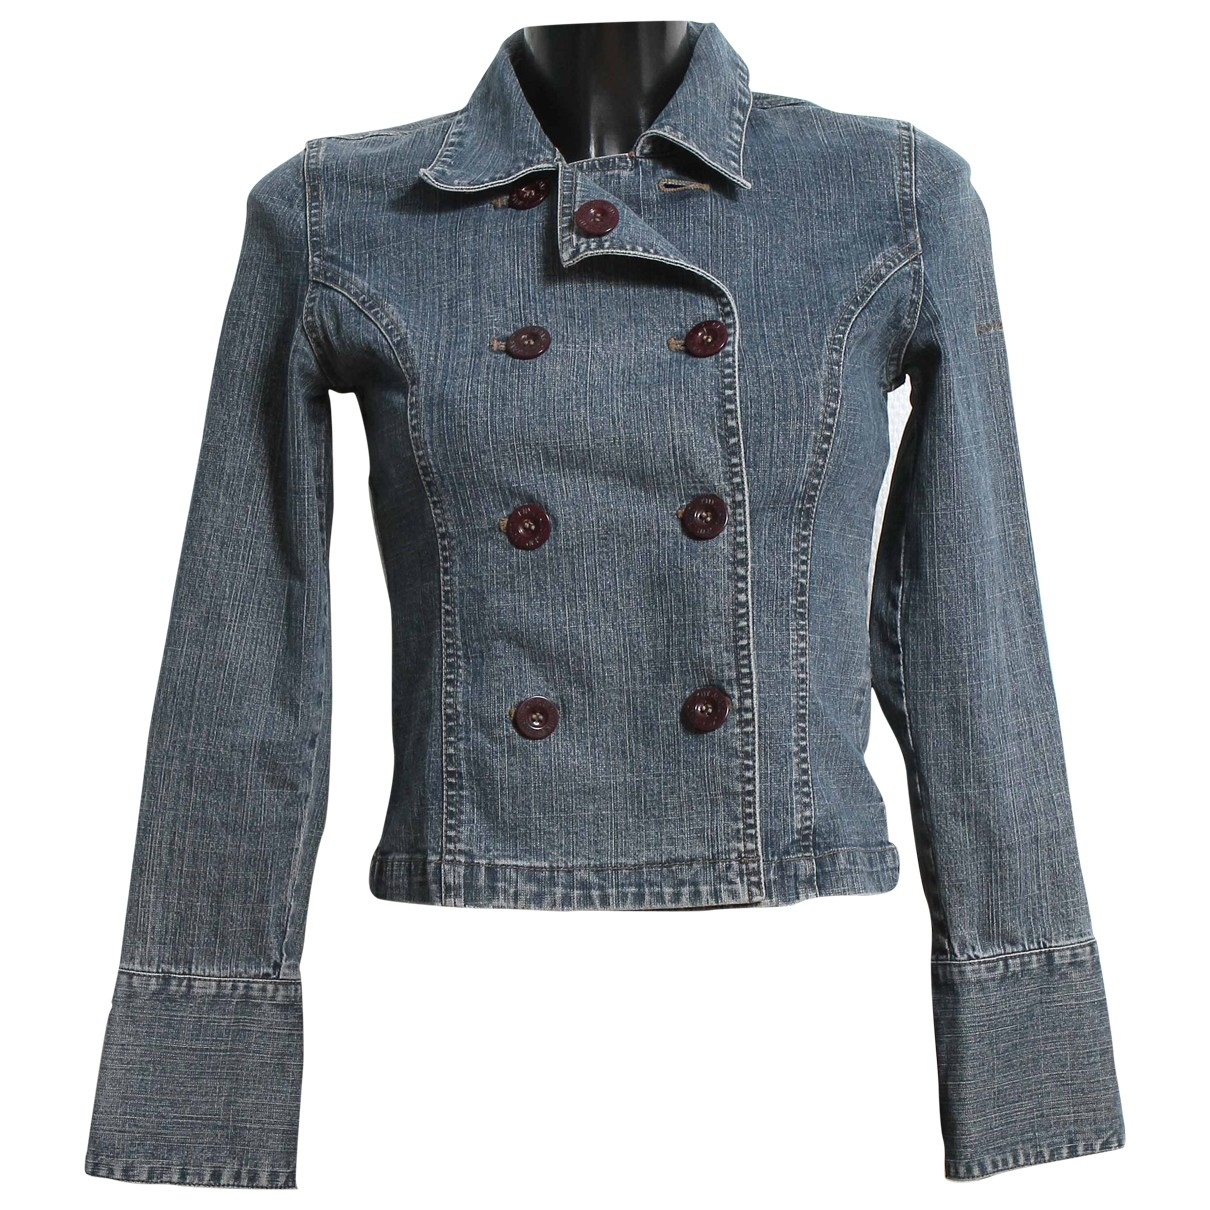 Dkny \N Blue Cotton jacket for Women XS International